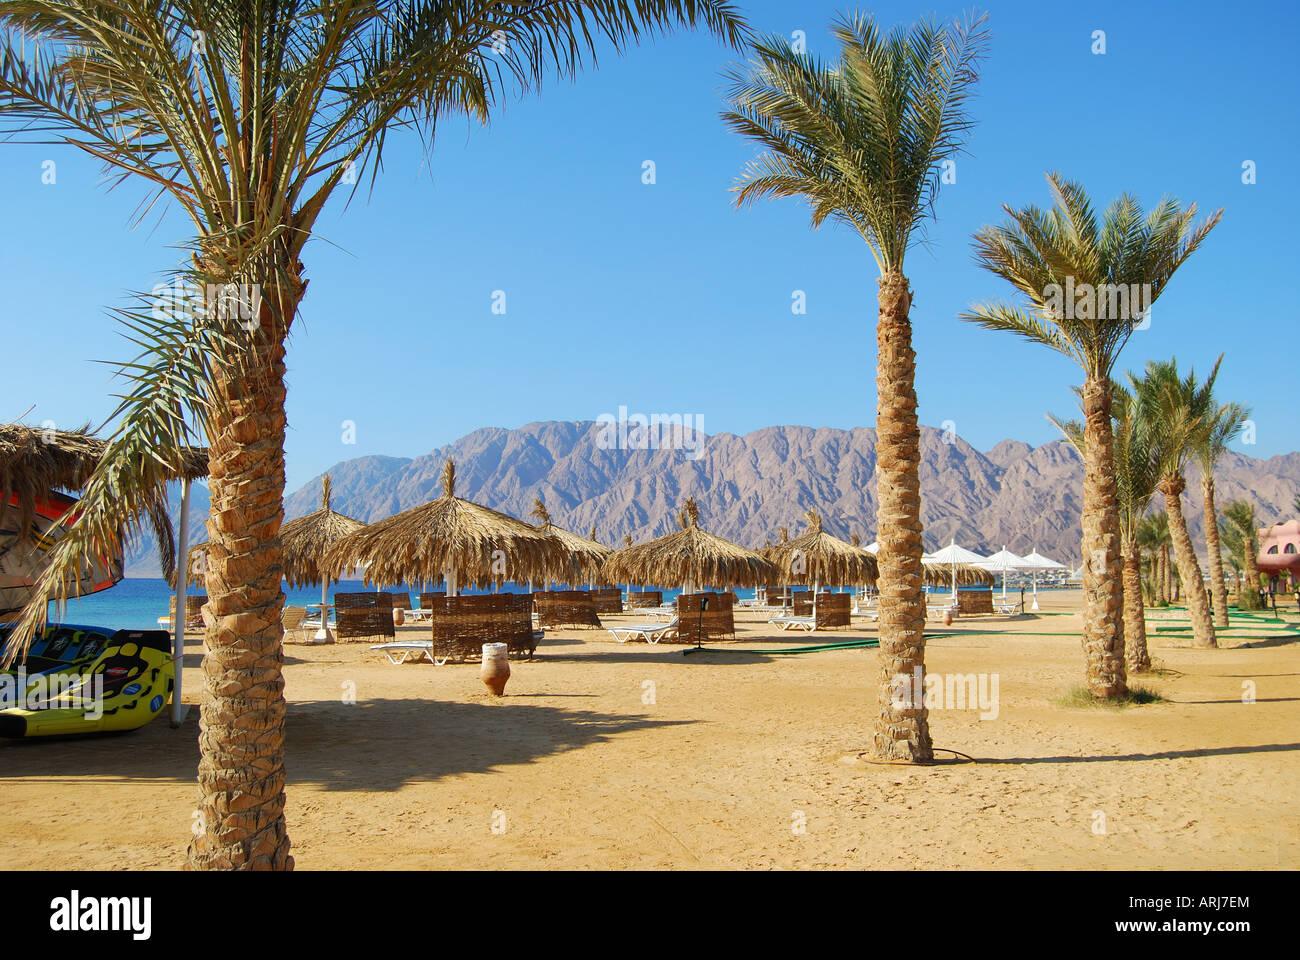 Hilton Nuweiba Coral Resort Hotel beach, Nuweiba, Sinai Peninsula, Republic of Egypt - Stock Image